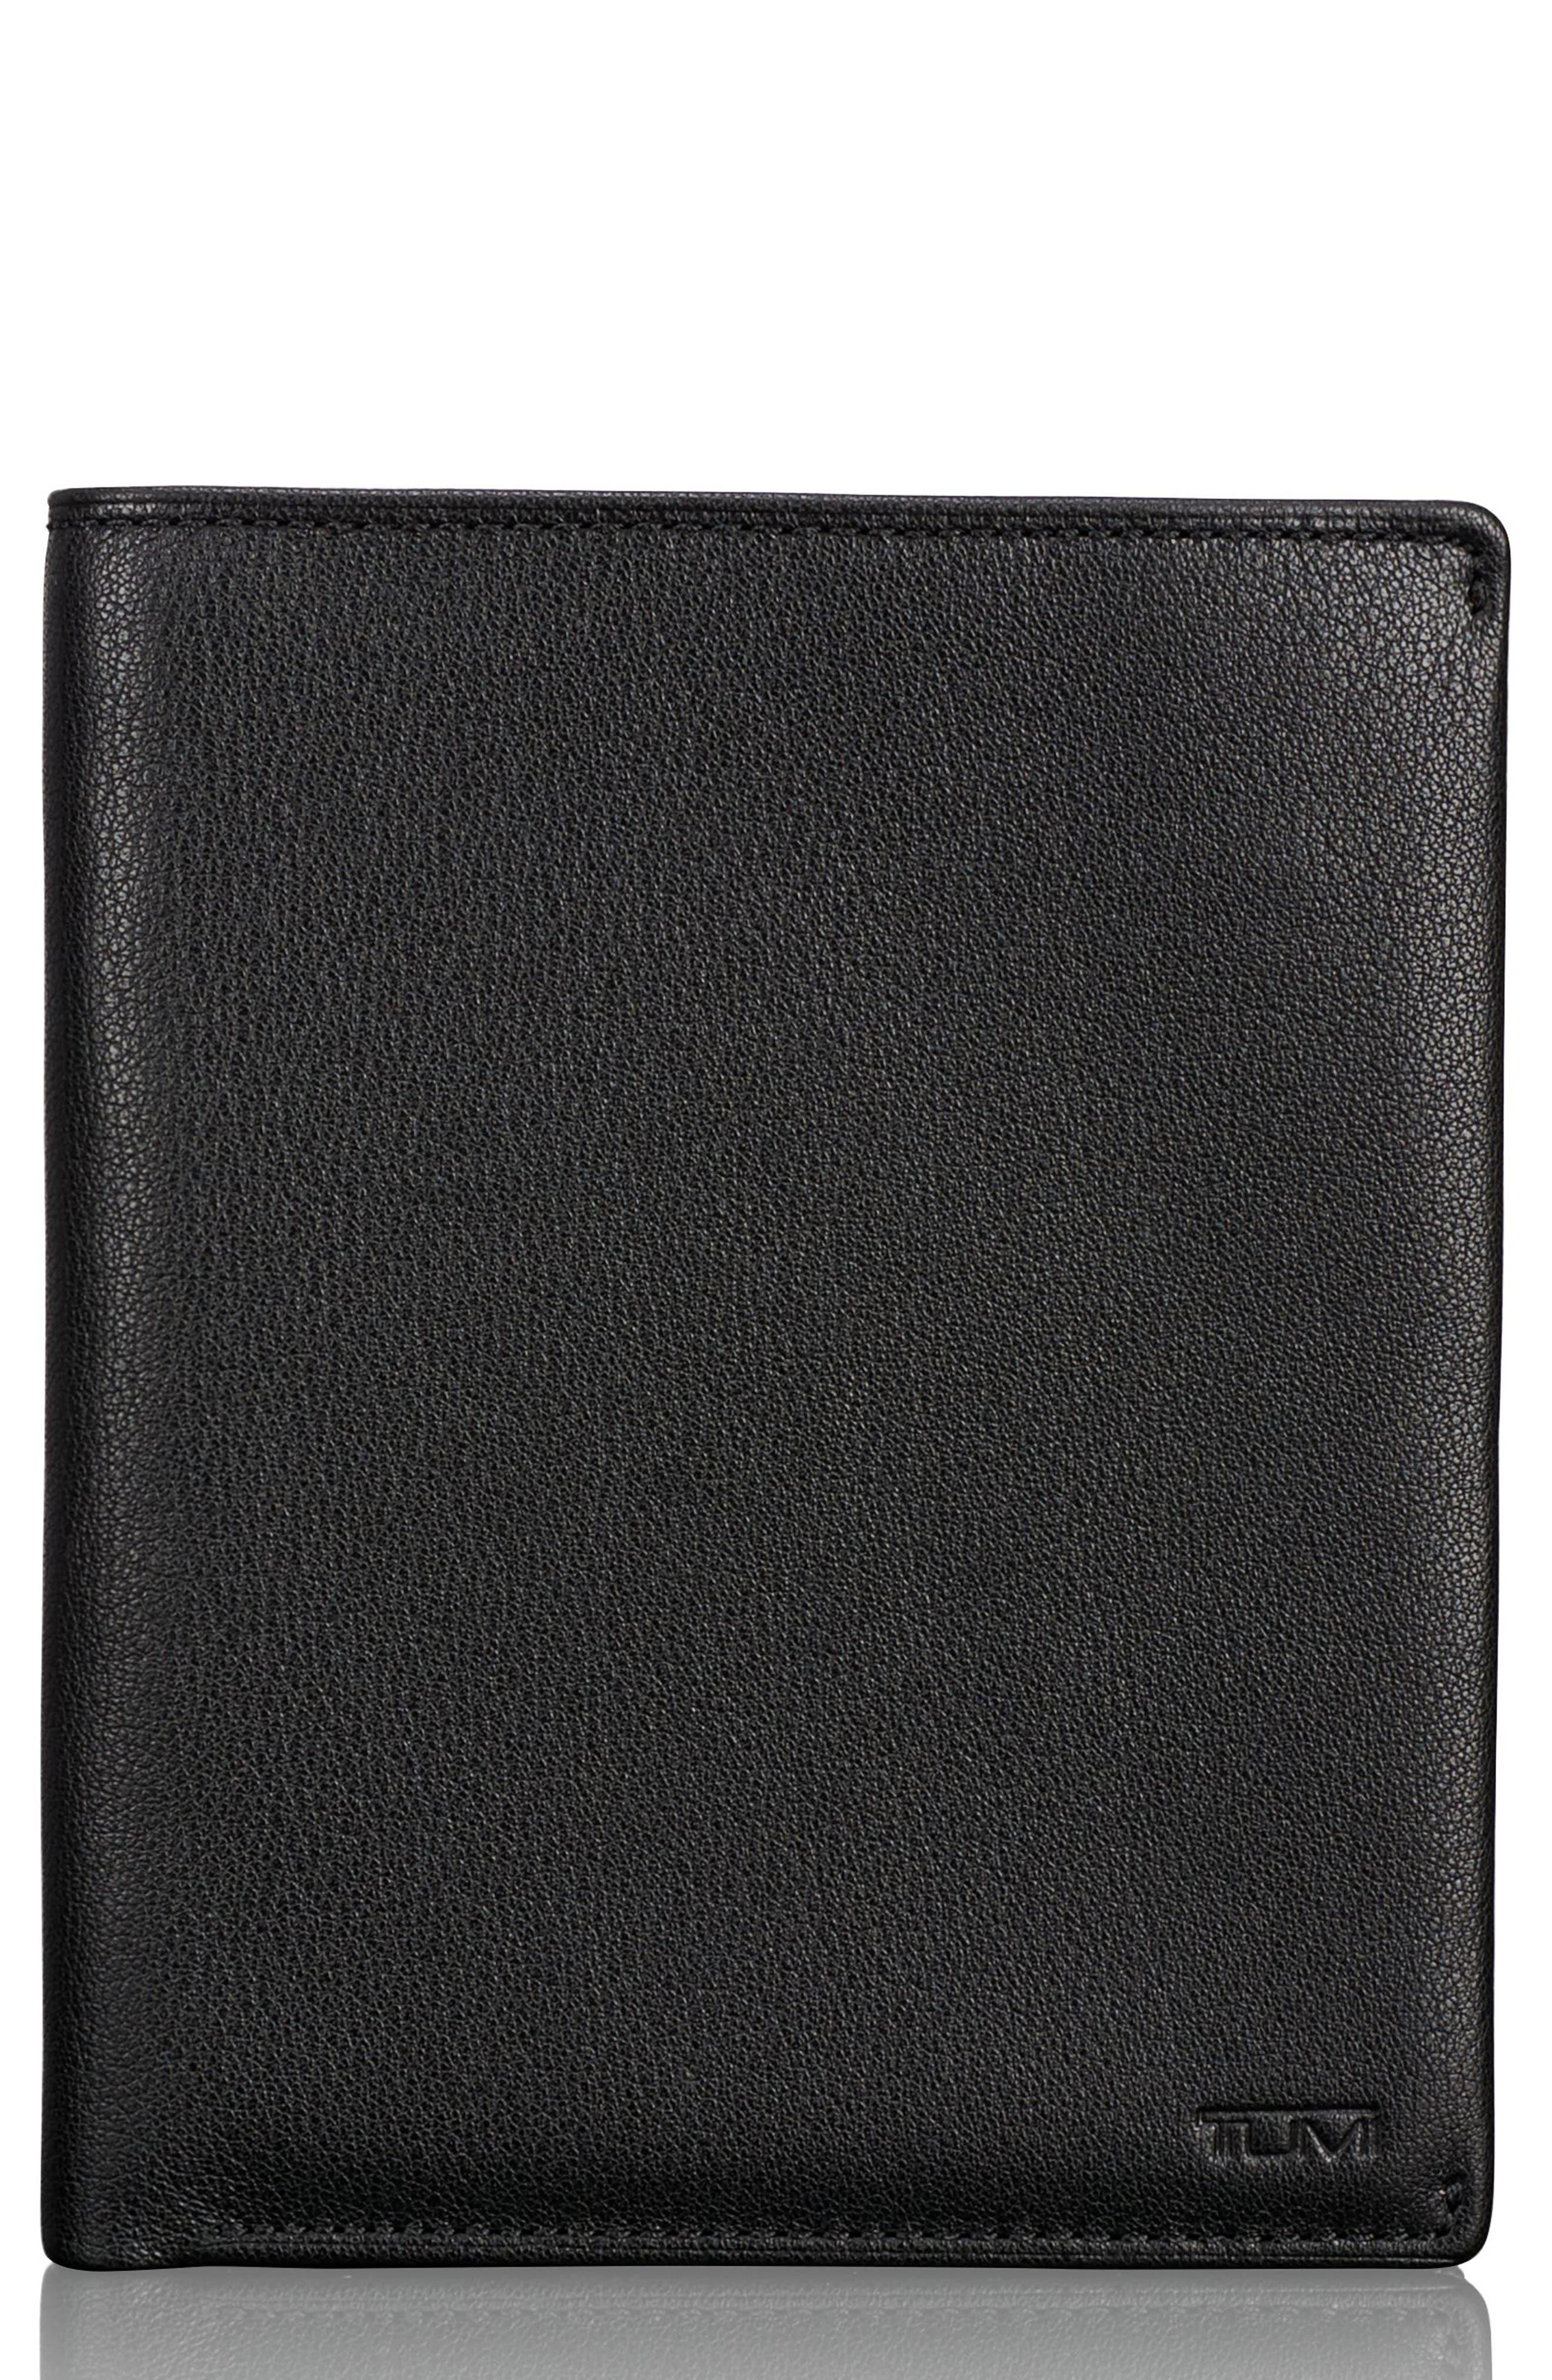 Tumi Leather Passport Case